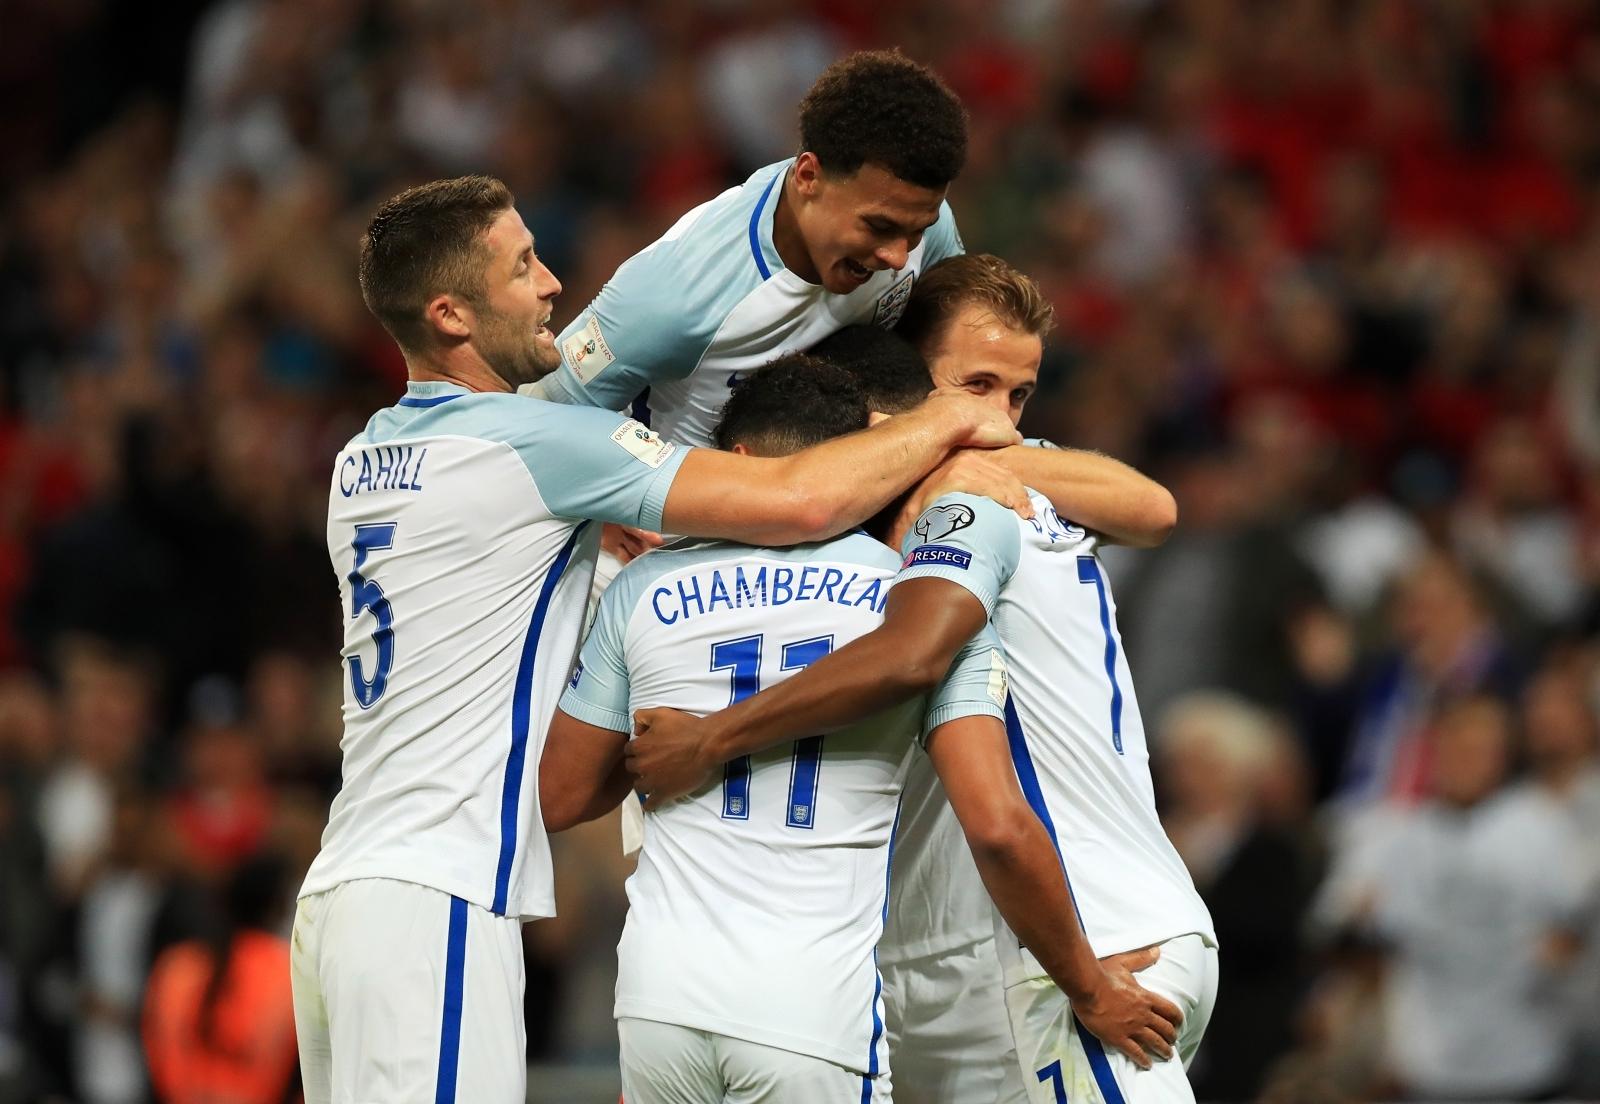 Uk Football: FA Bulks Up Cybersecurity Ahead Of World Cup 2018 Amid